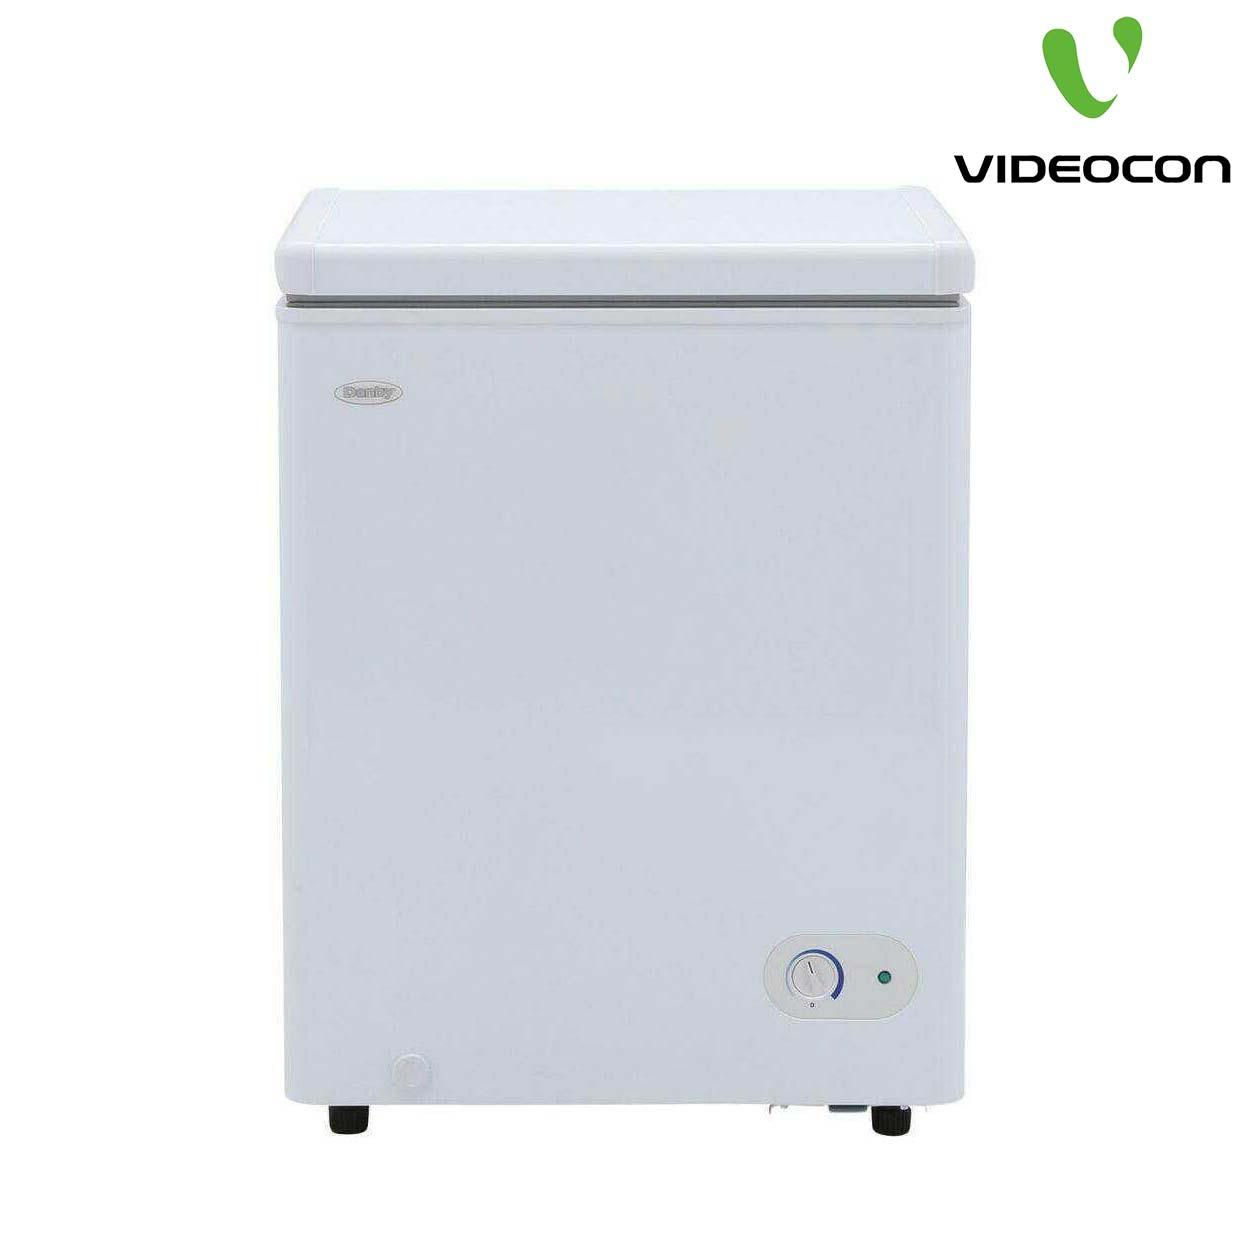 Videocon Chest Freezer VD200- 200Ltr